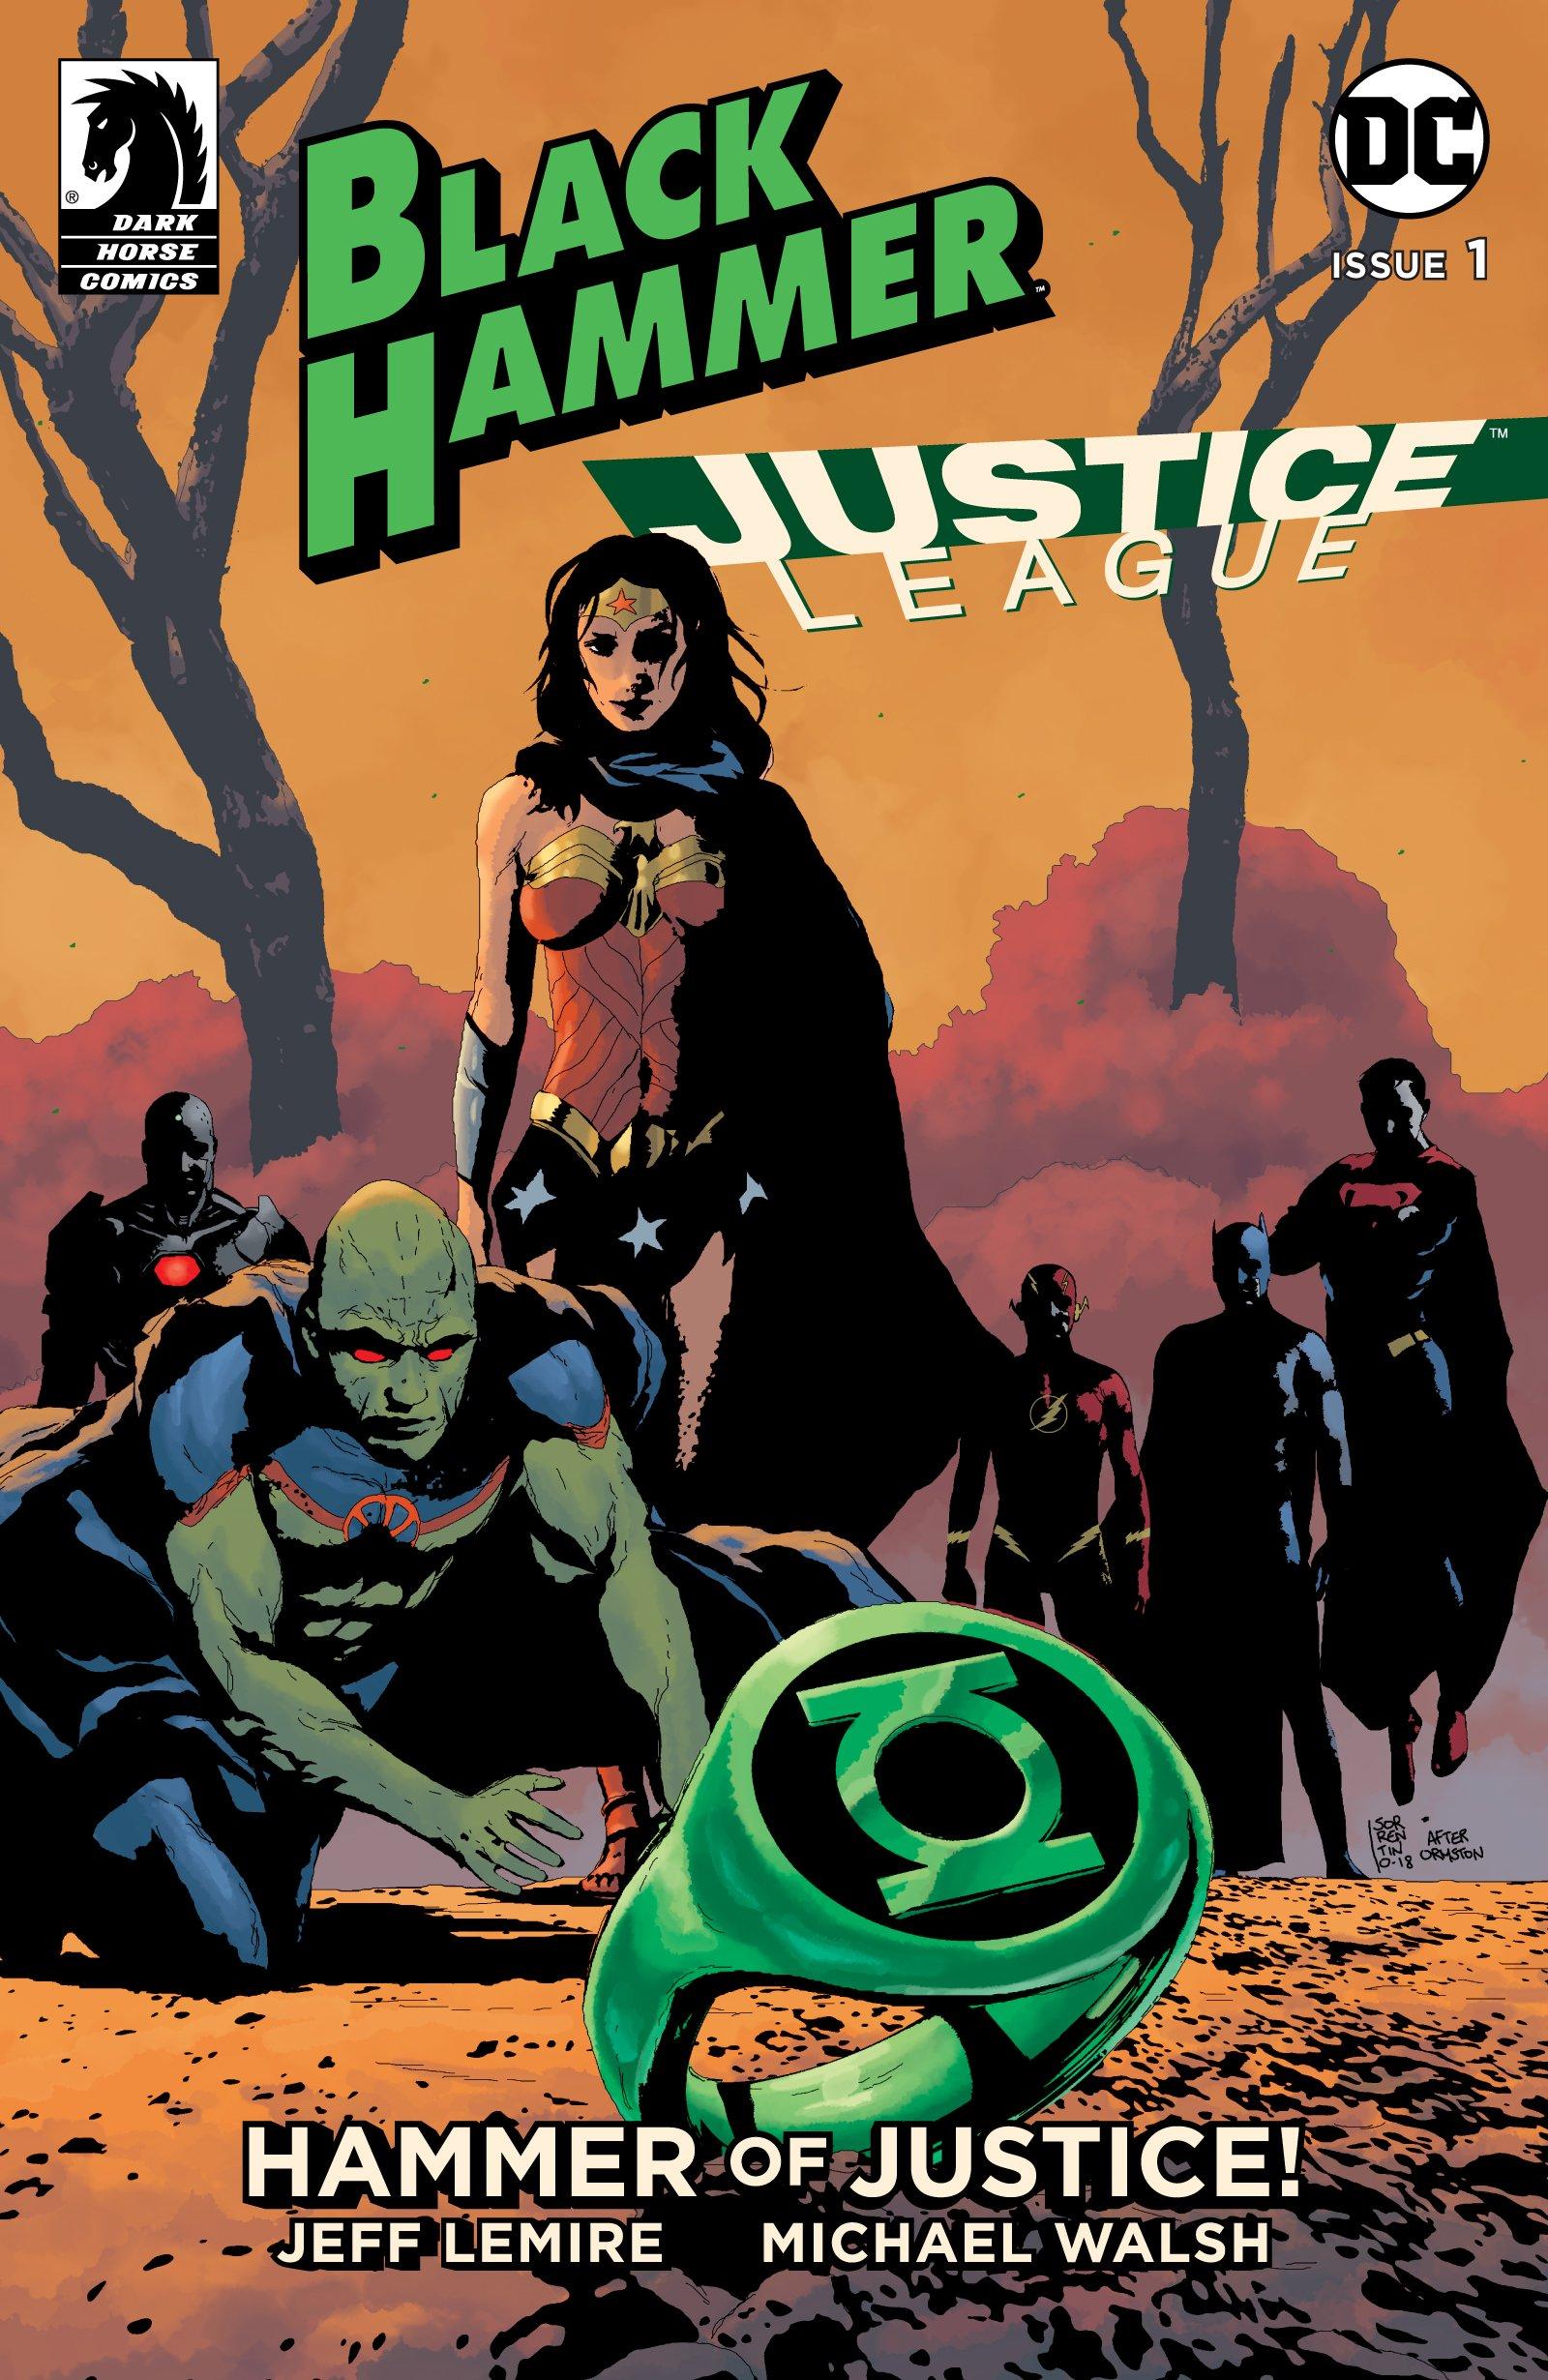 Black Hammer Justice League Hammer of Justice Vol 1 1 Sorrentino Variant B.jpg